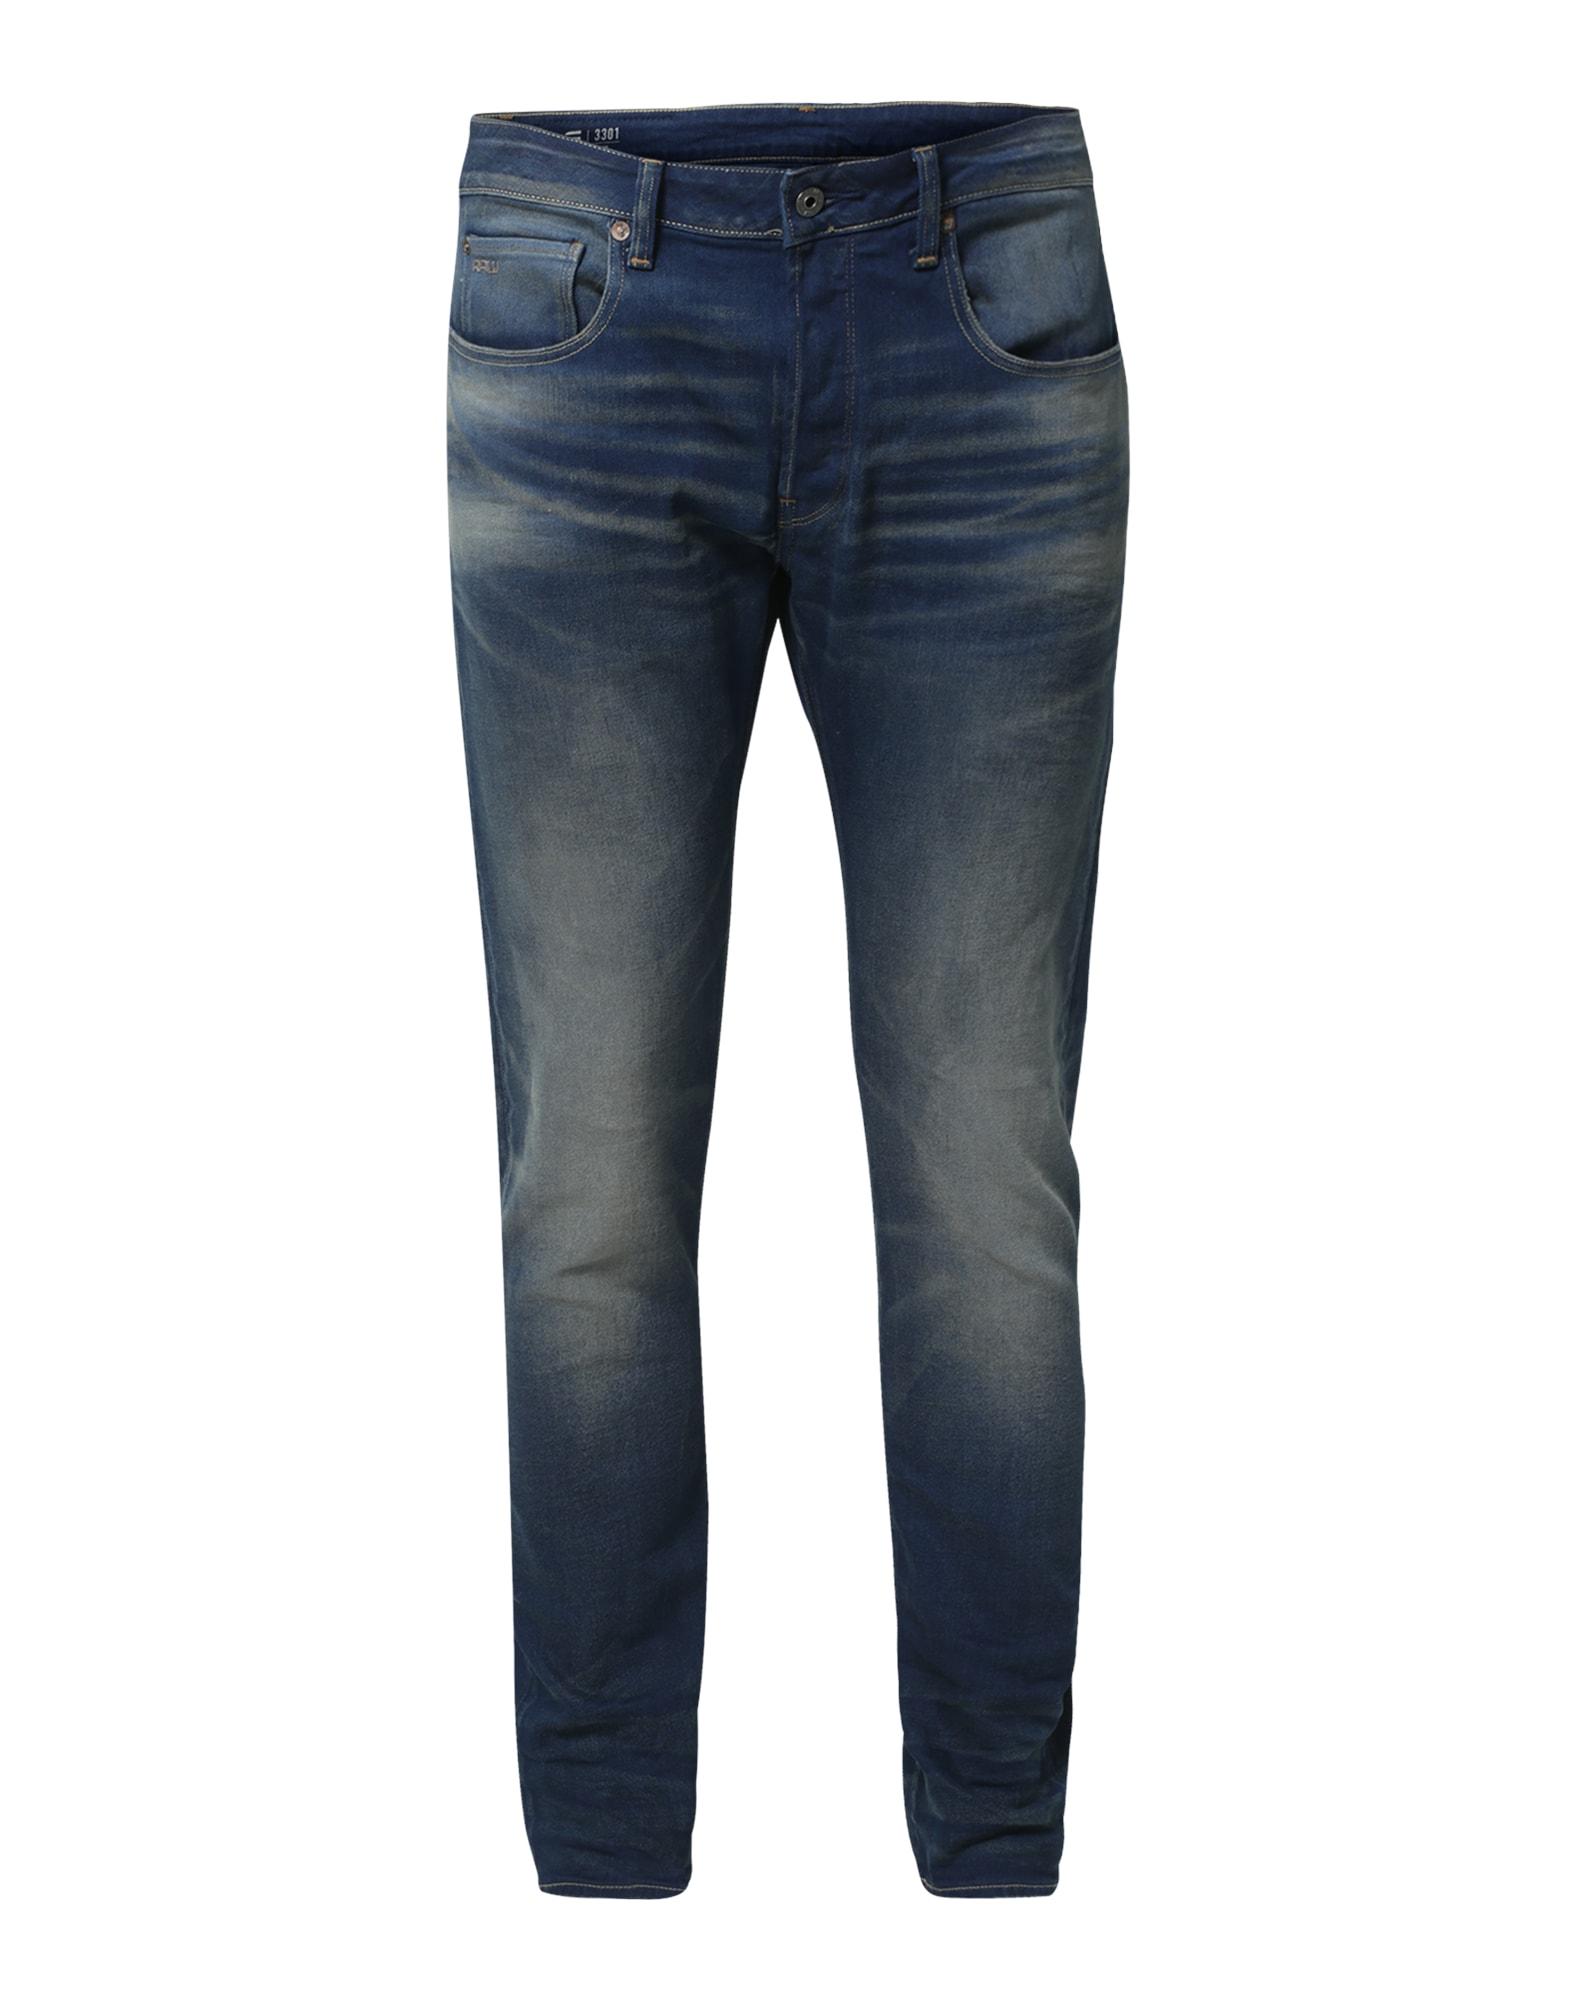 G-STAR RAW Heren Jeans 3301 Slim blauw